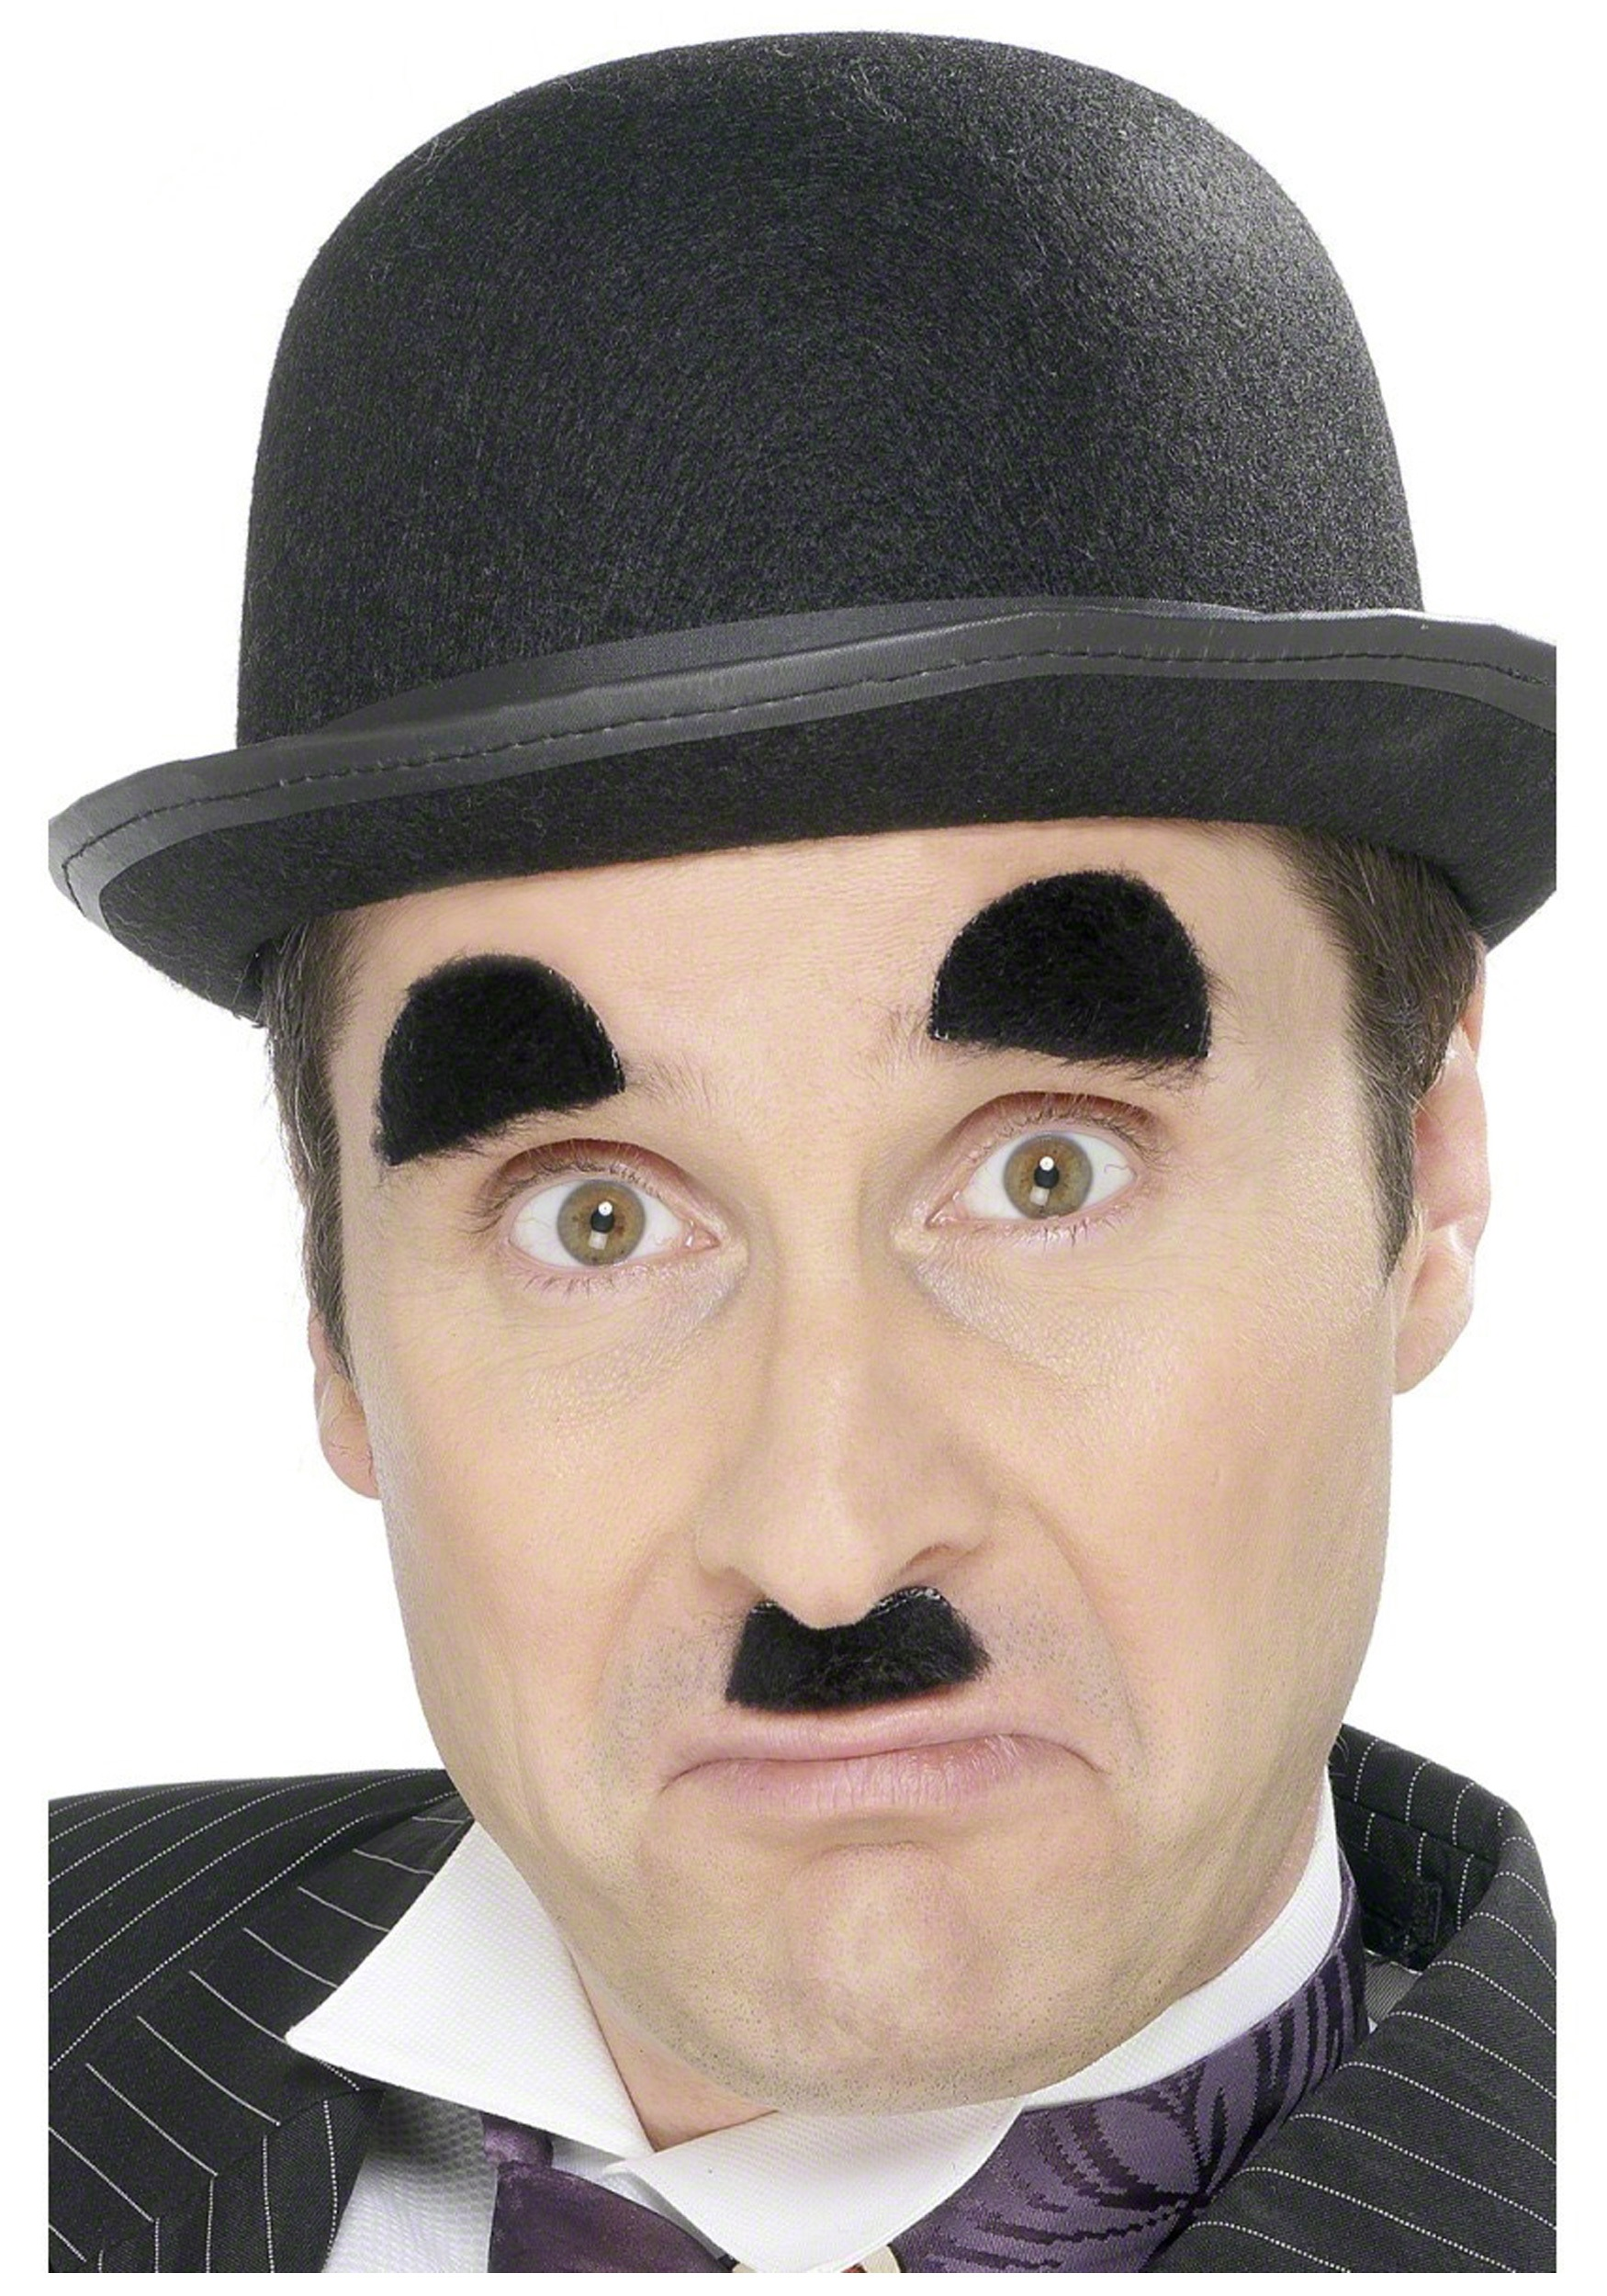 charlie-chaplin-mustache-and-eyebrows.jpg d55a53ff366